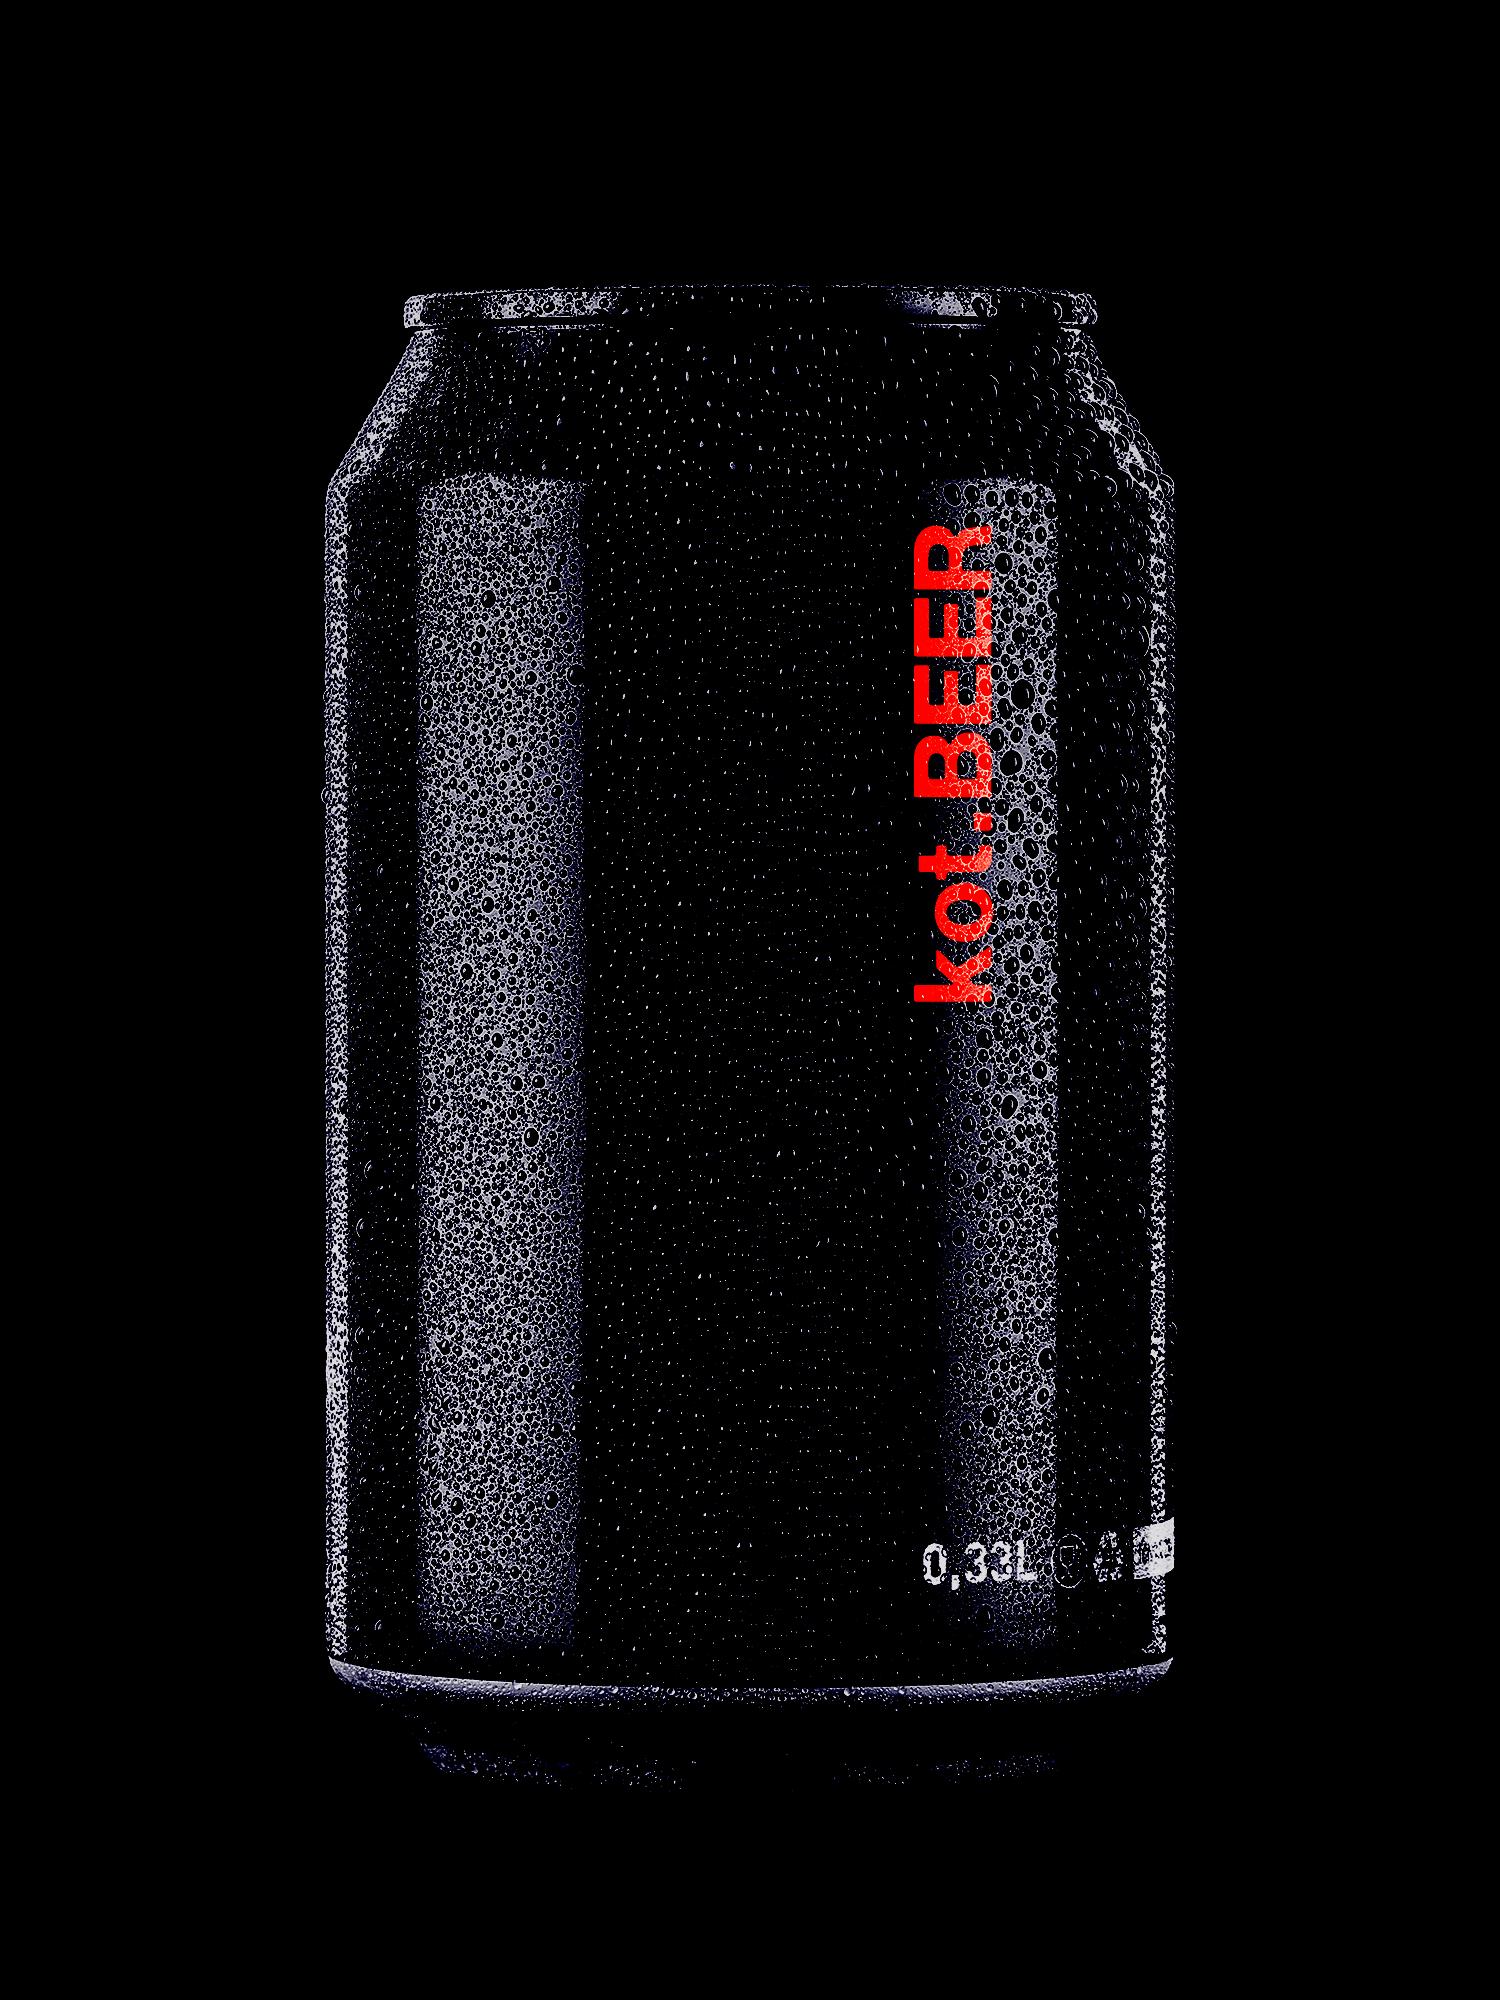 Kot Beer